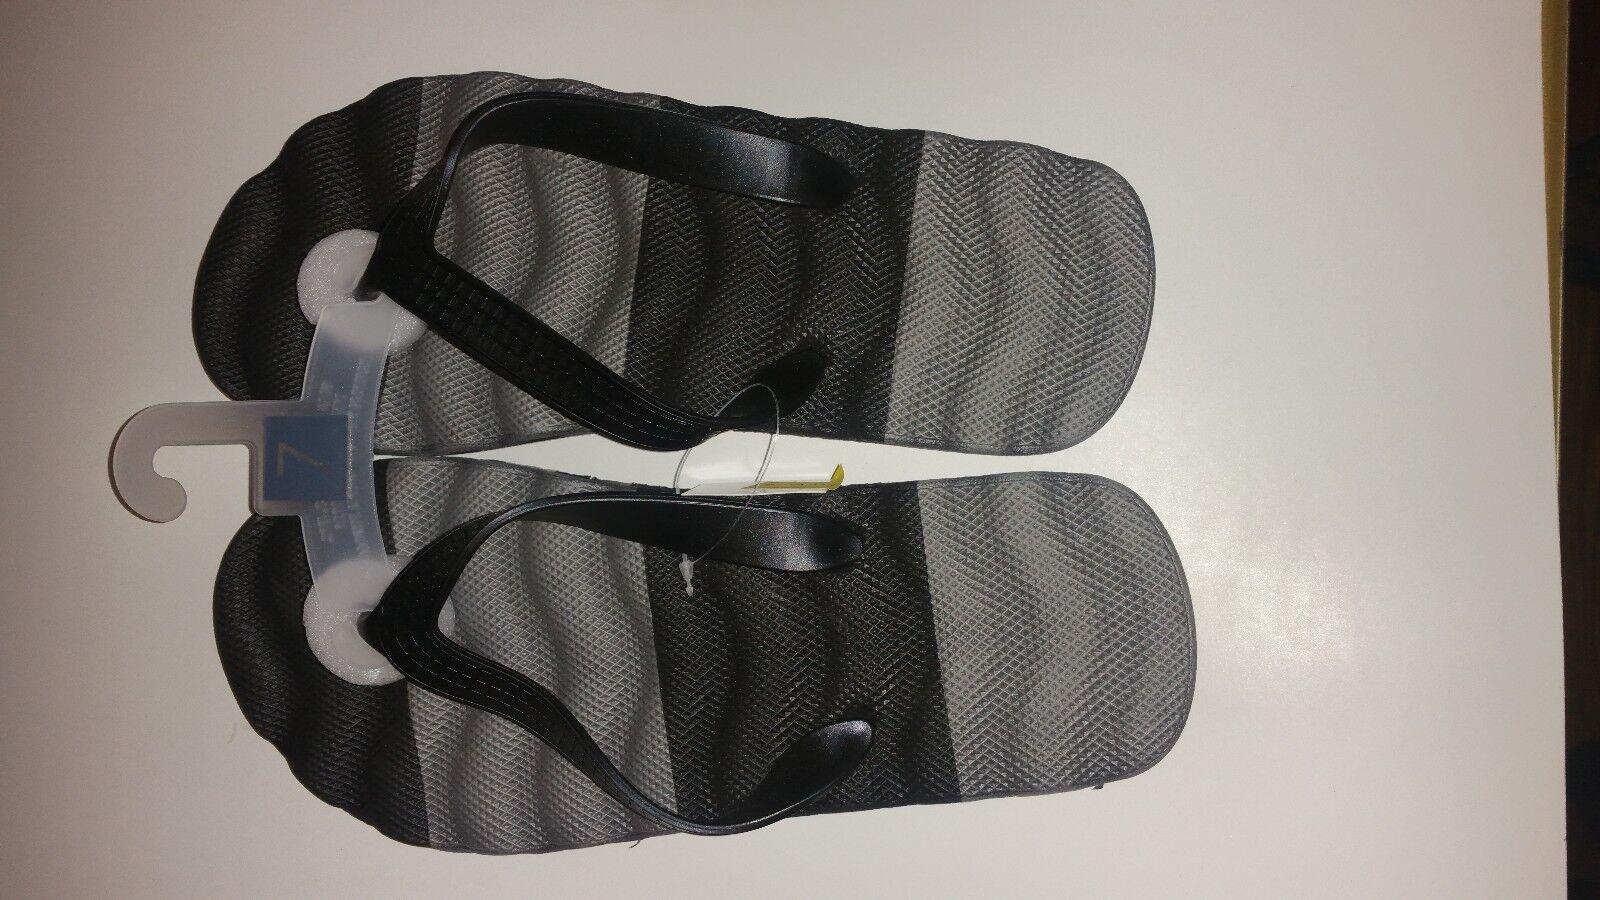 New Men's Sandals Lightweight None slip massage Flip Flops Sandals Men's  sizes 7-12 6ce456